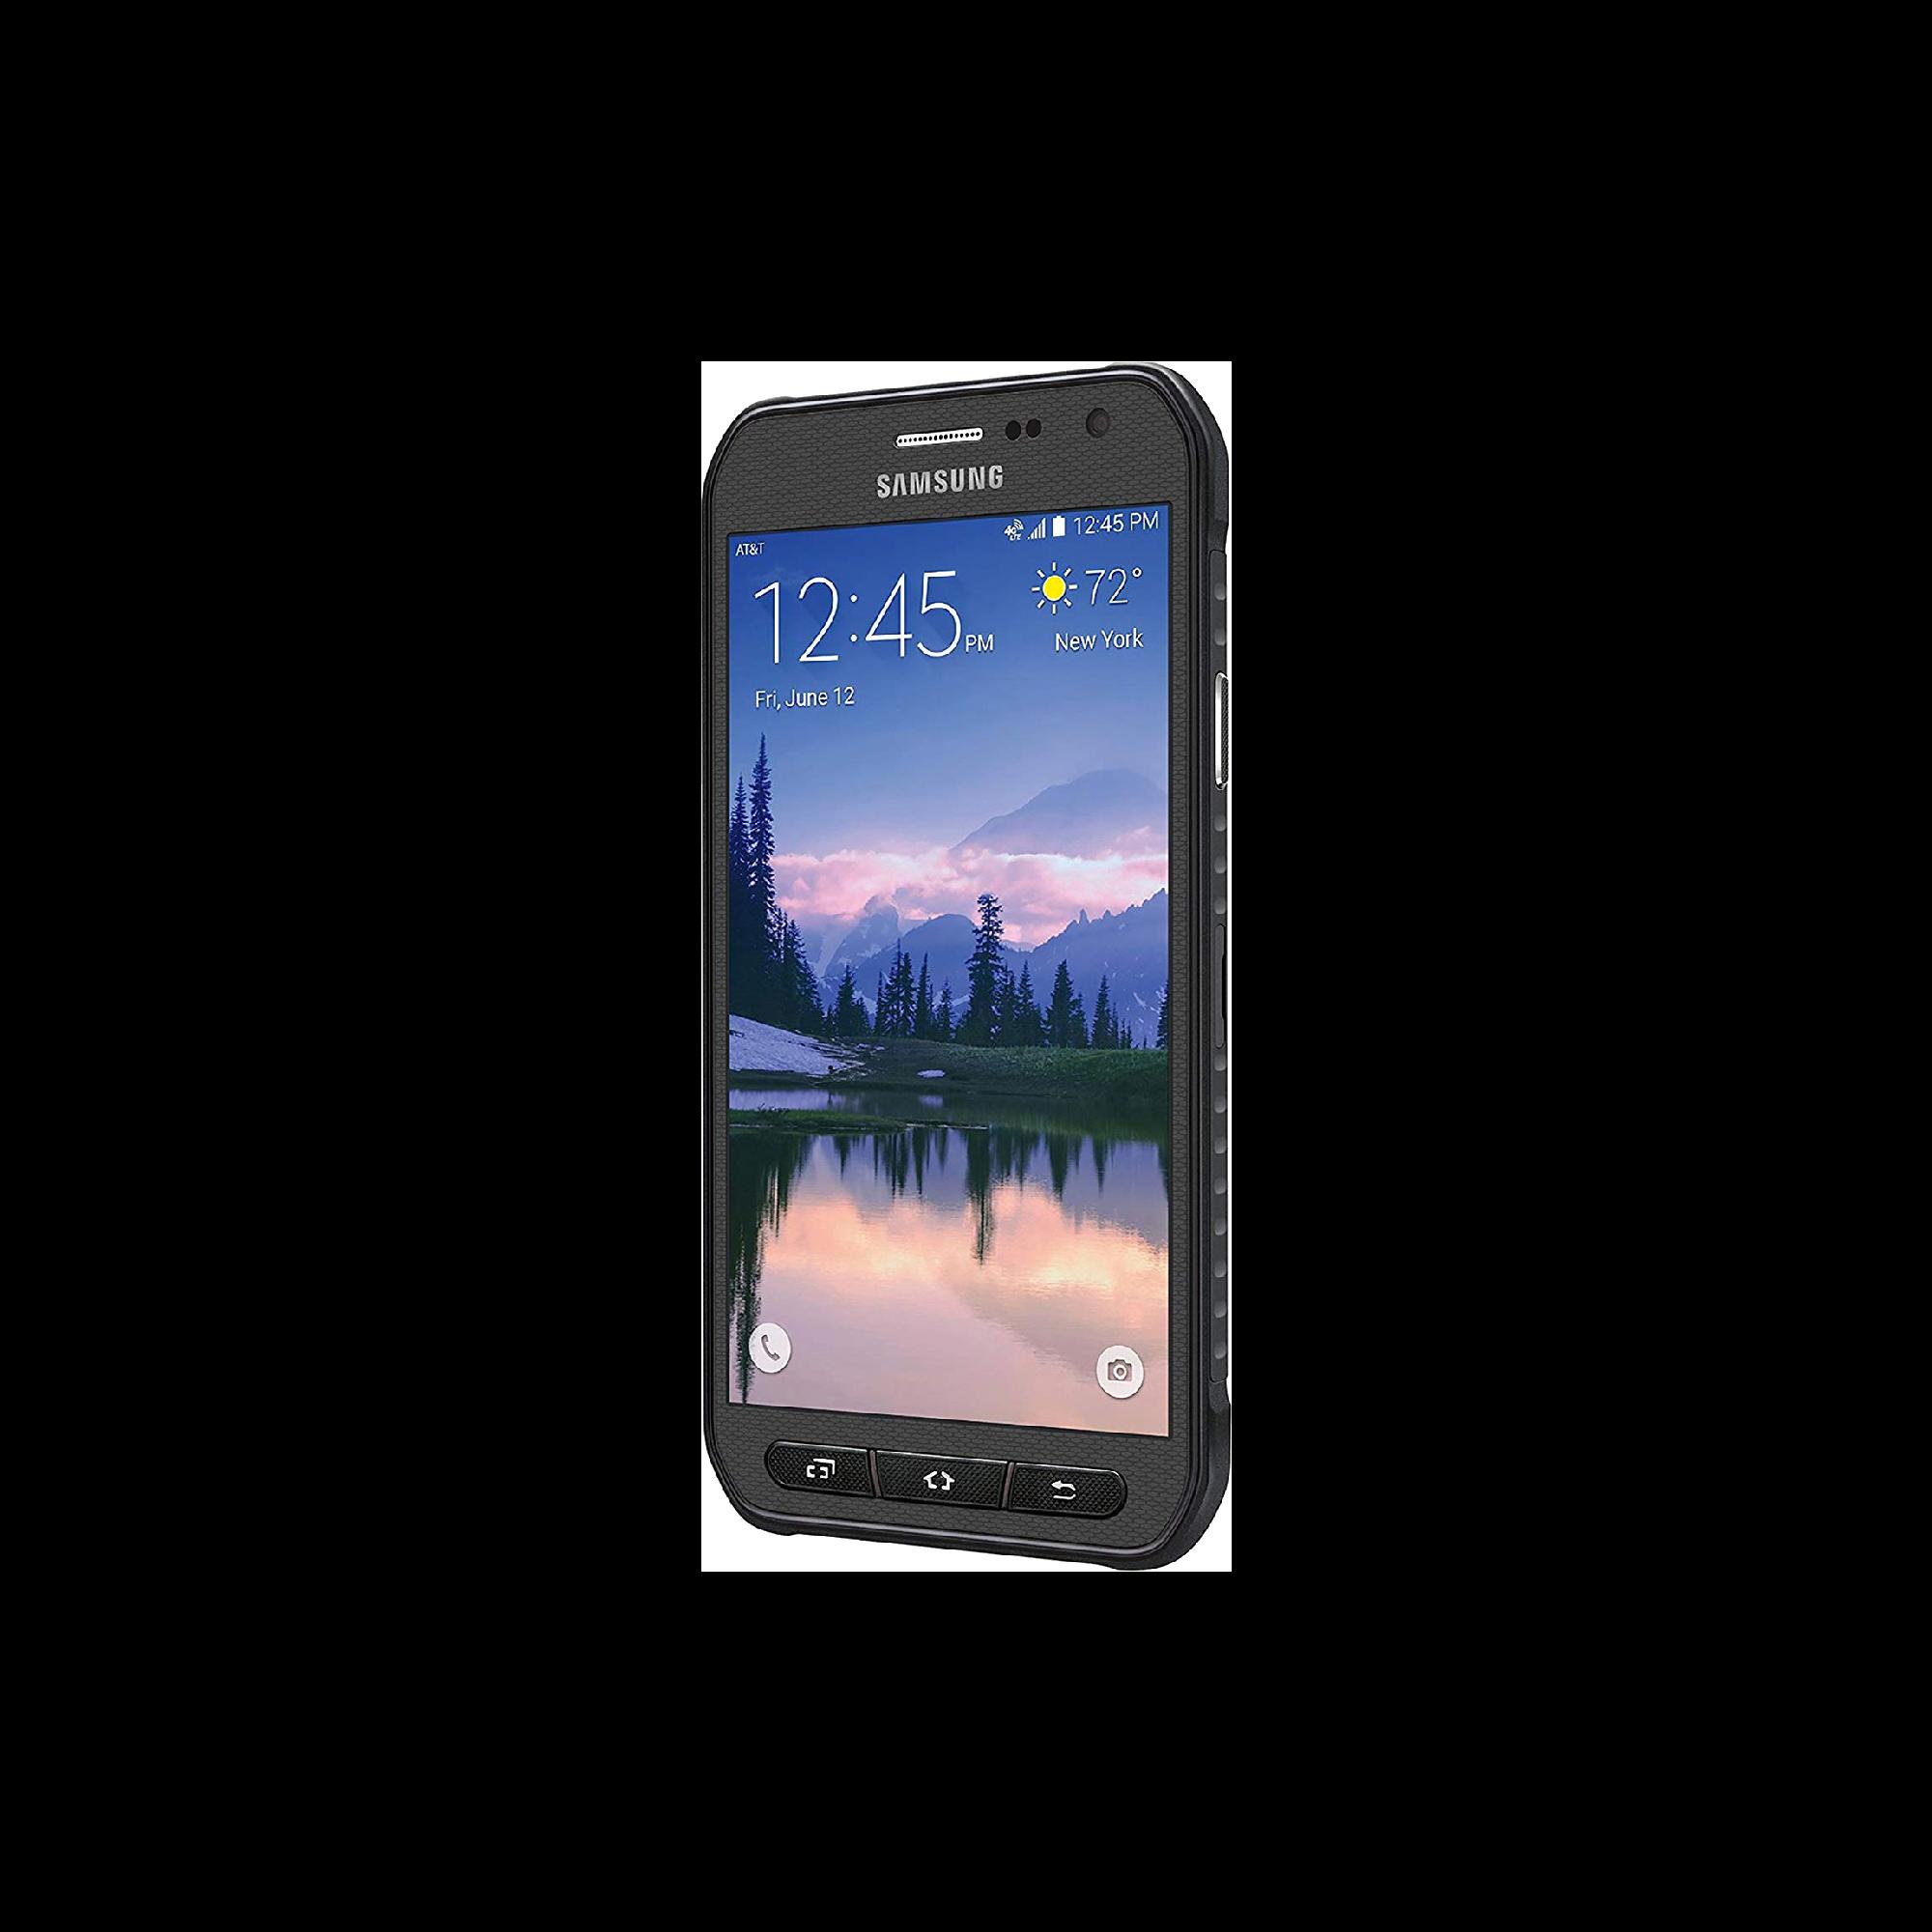 Samsung S6 Active | $199 + tax